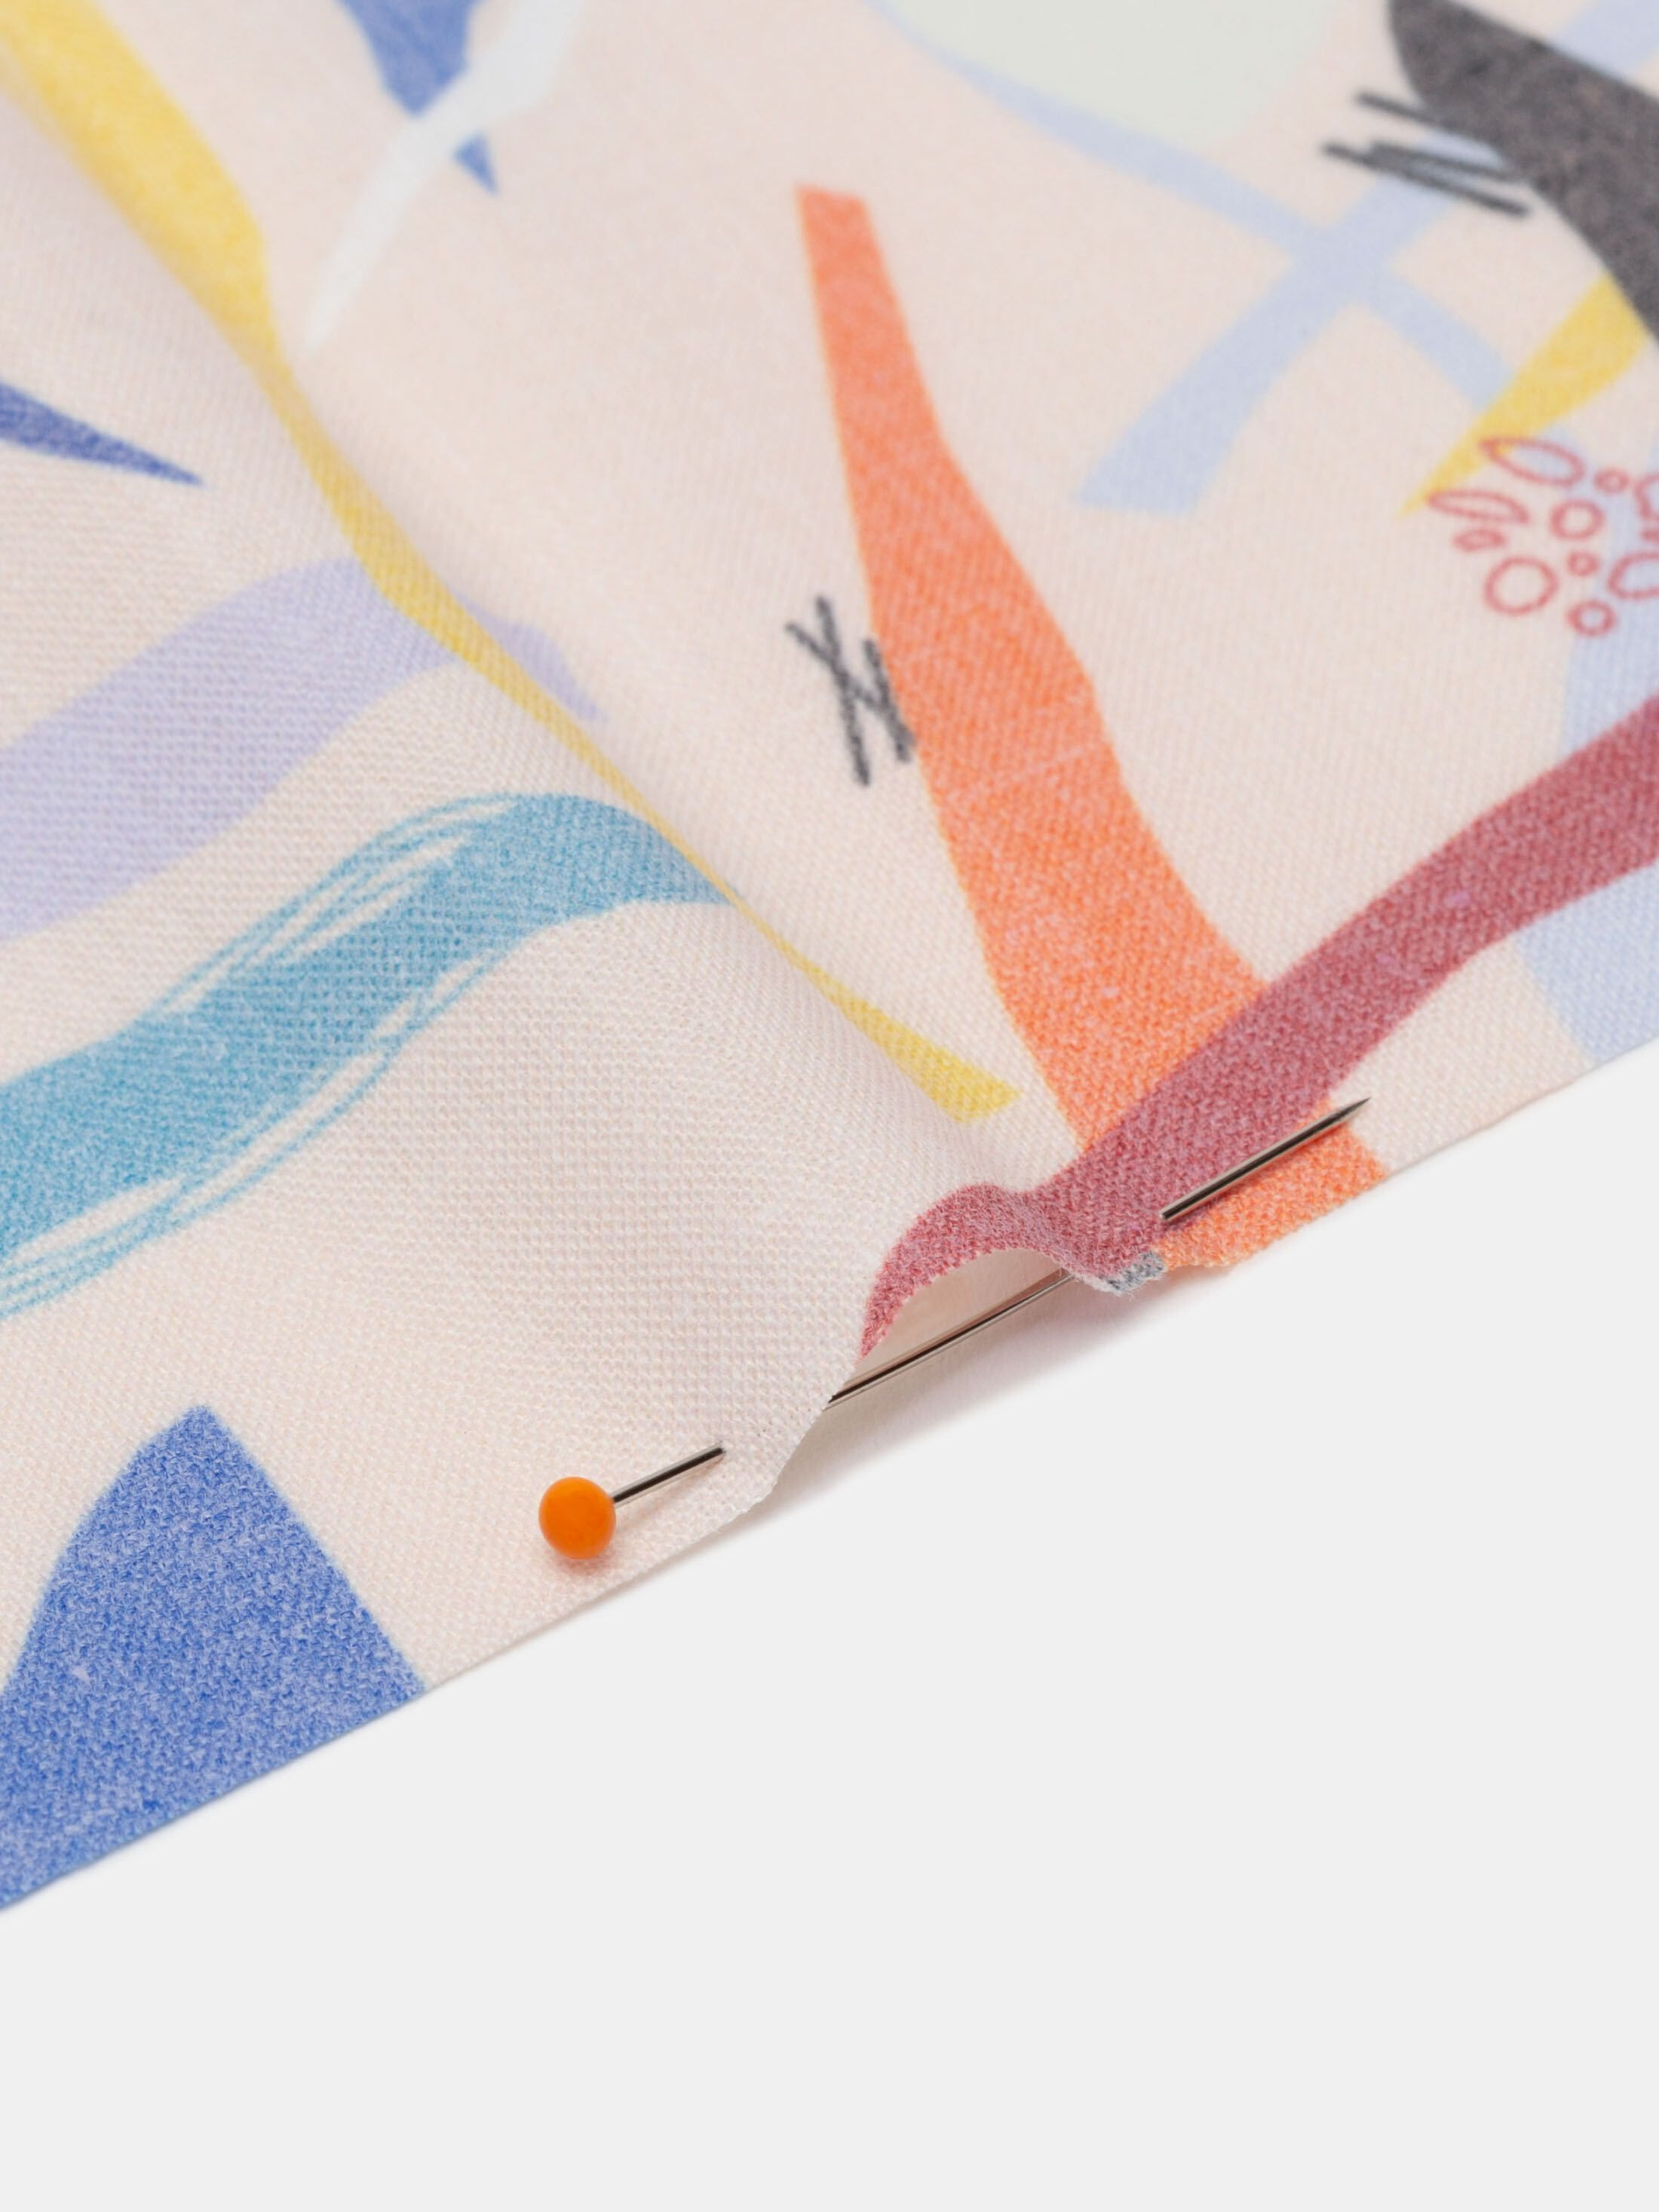 Vintage Fade digital print fabric